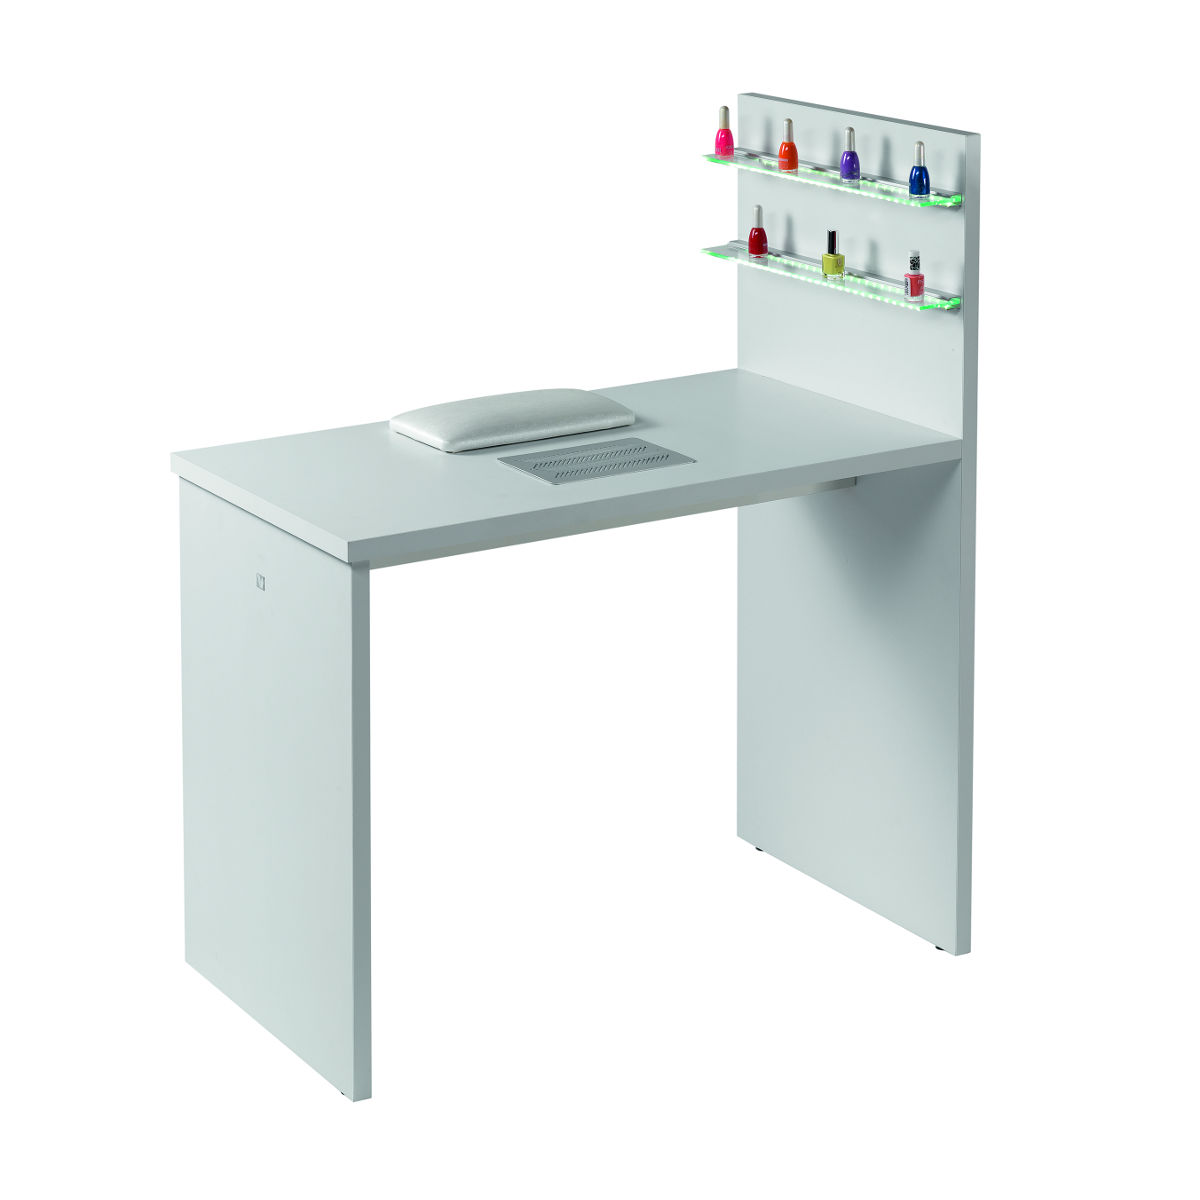 Table manucure grace mobicoiff - Meuble rangement vernis a ongles ...